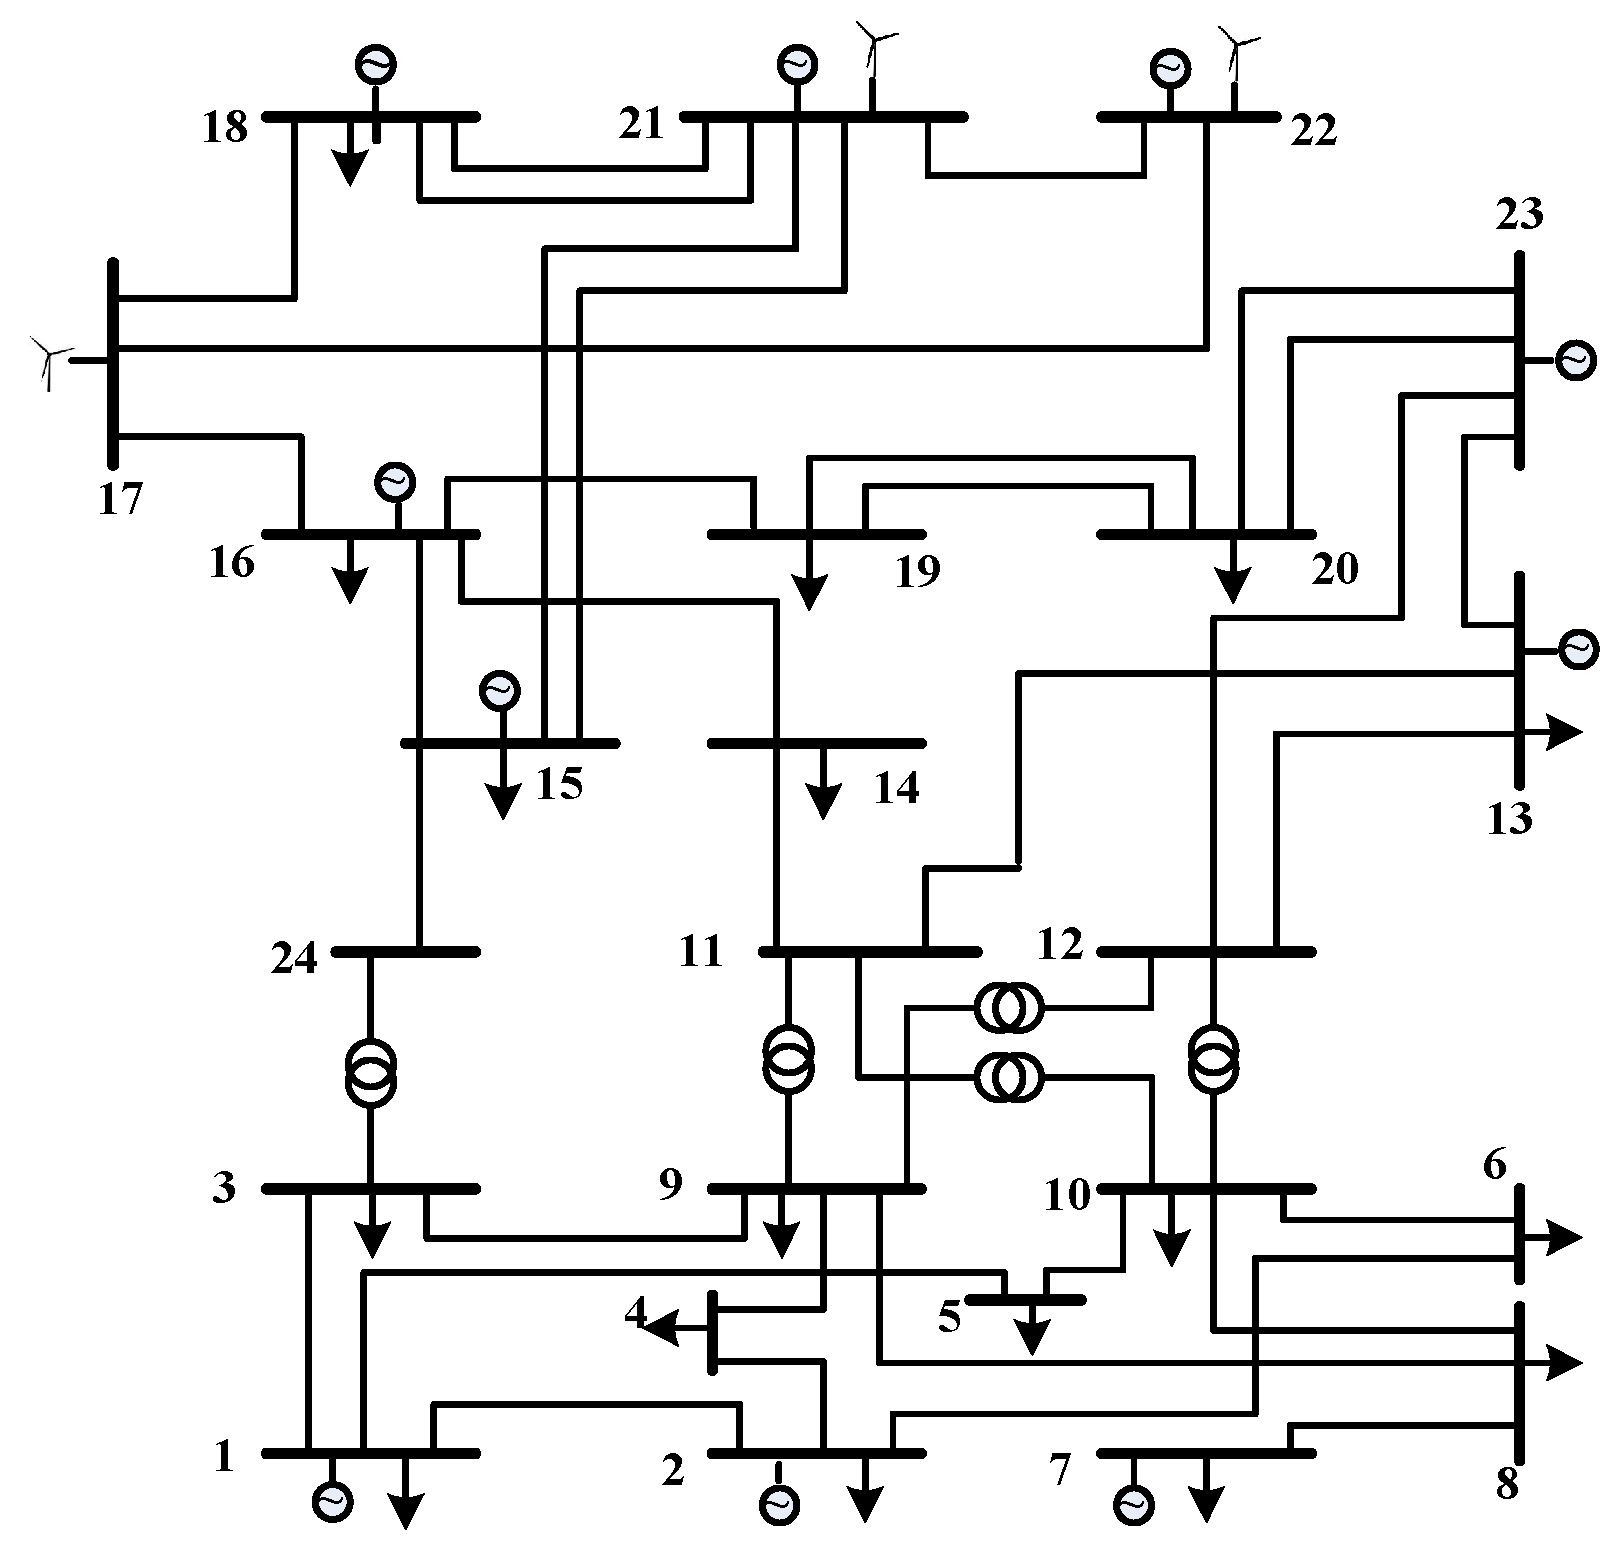 Load flow study in matlab